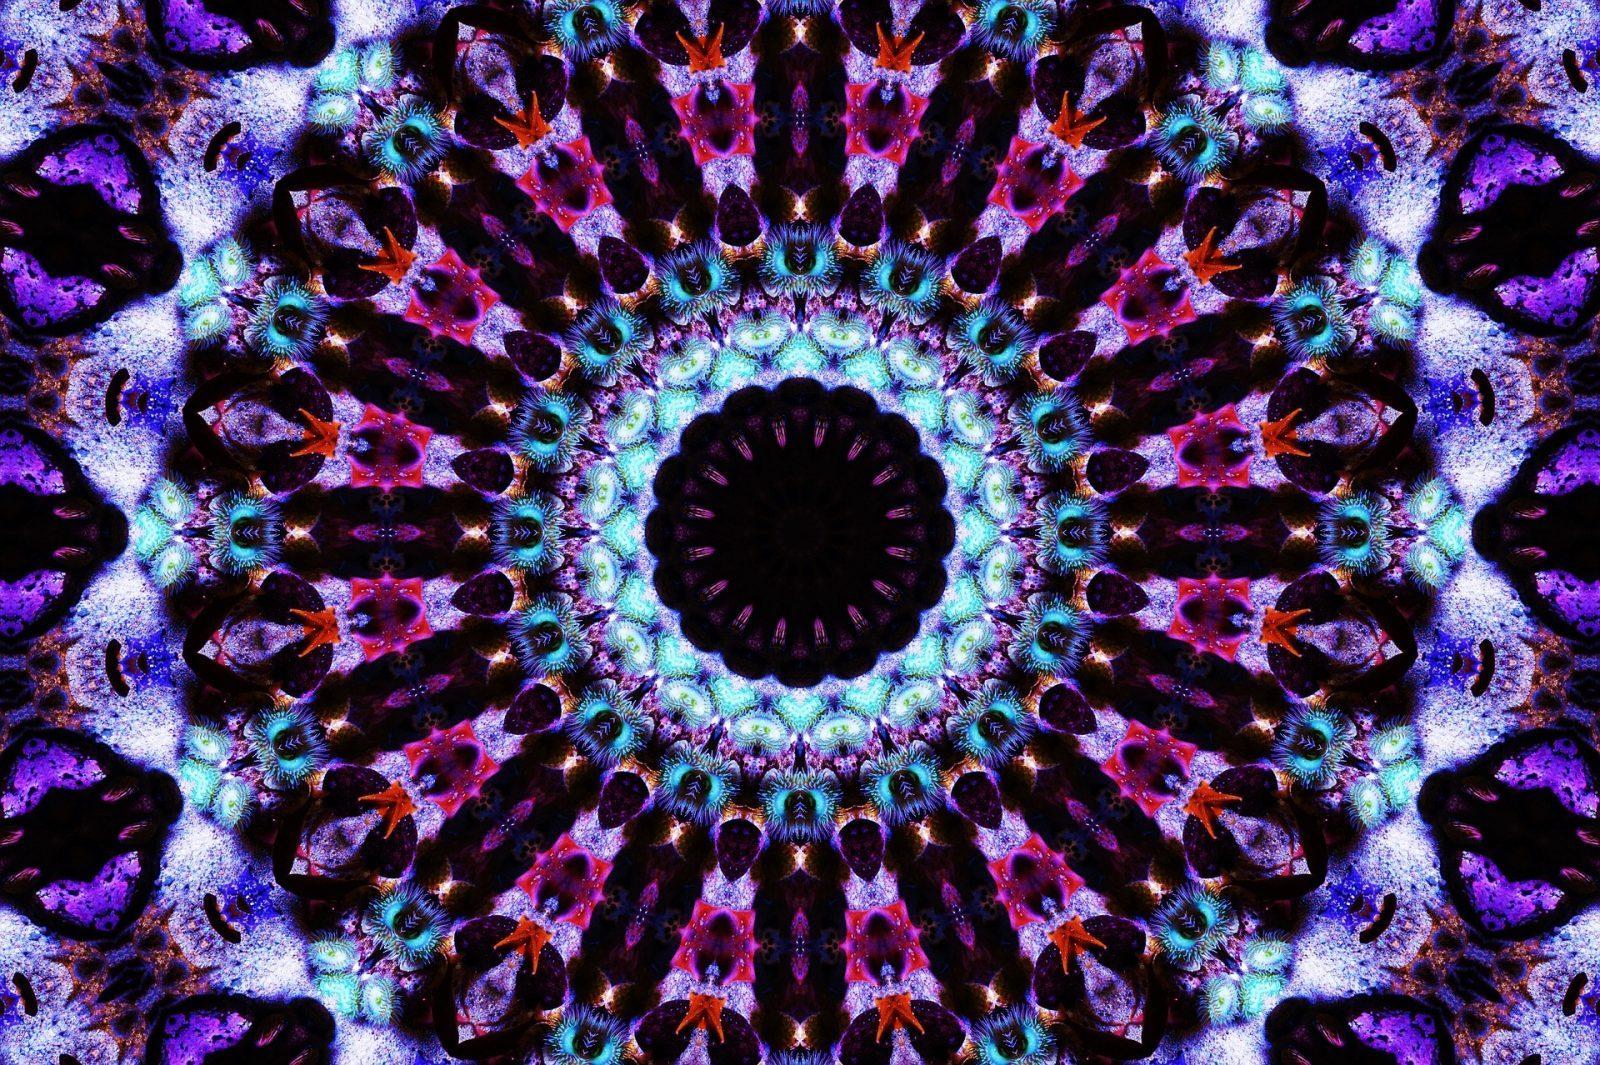 Scottish Inventions - Kaleidoscopes